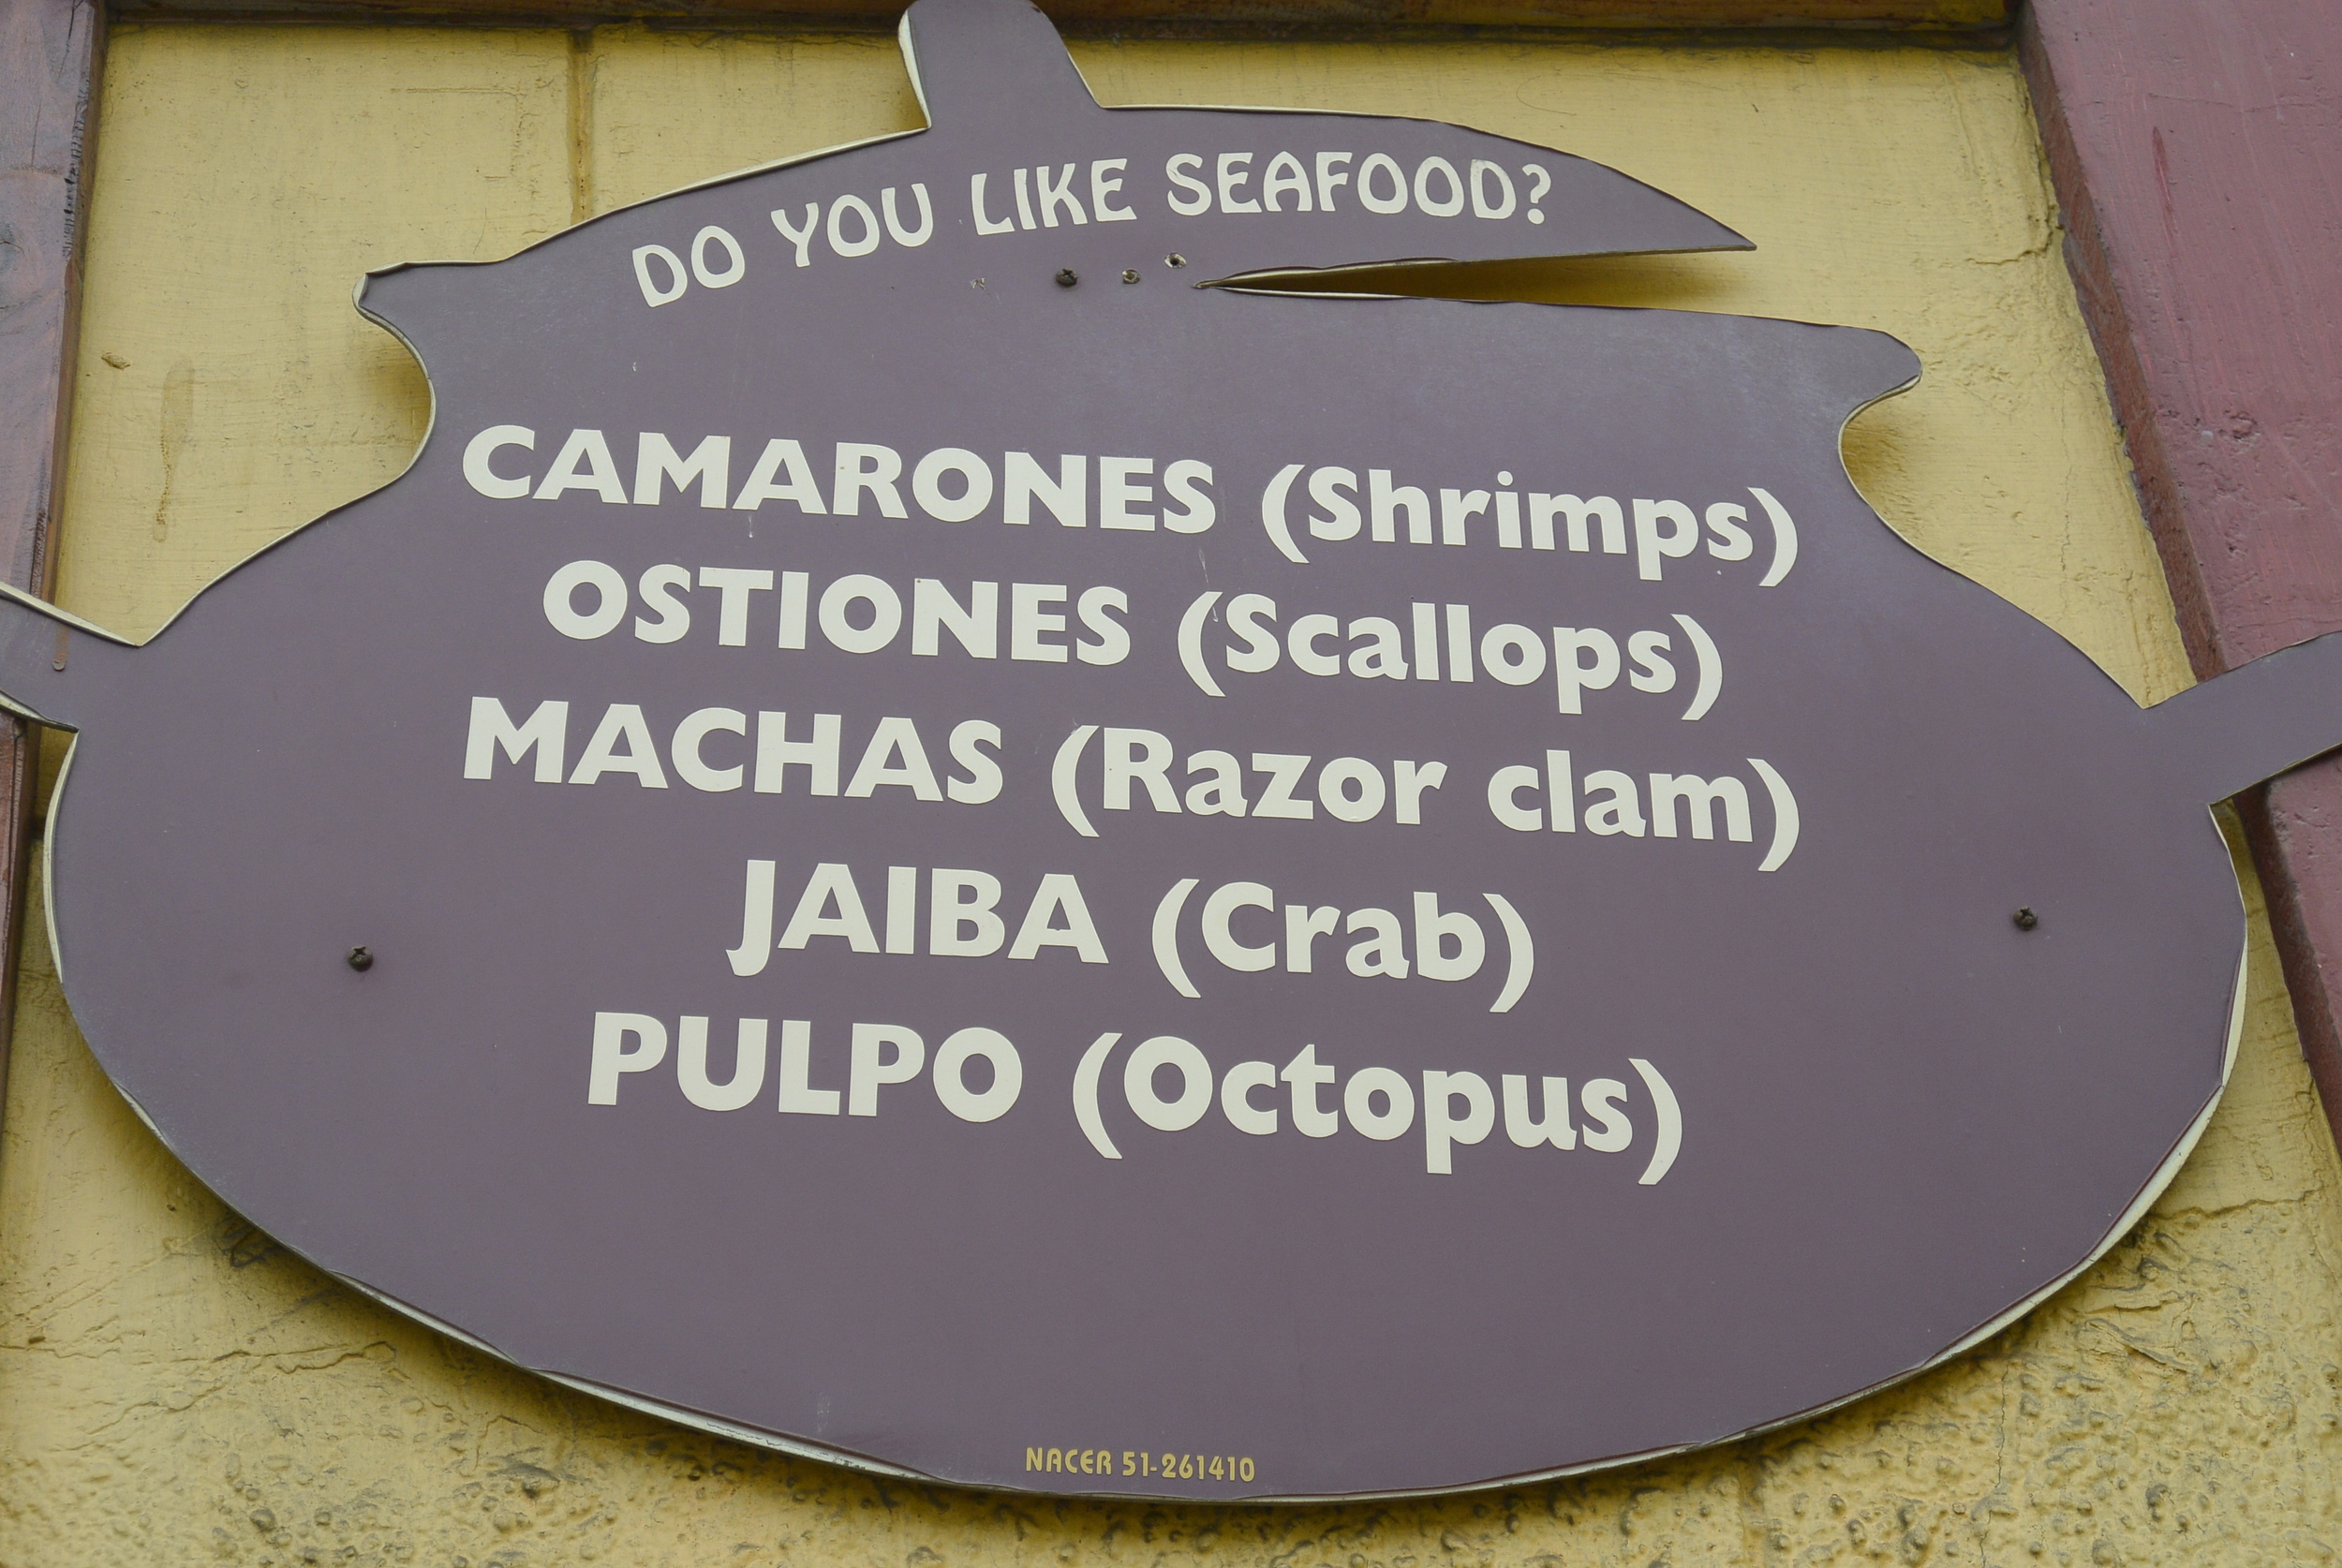 Do you like seafood? Coquimbo Chile